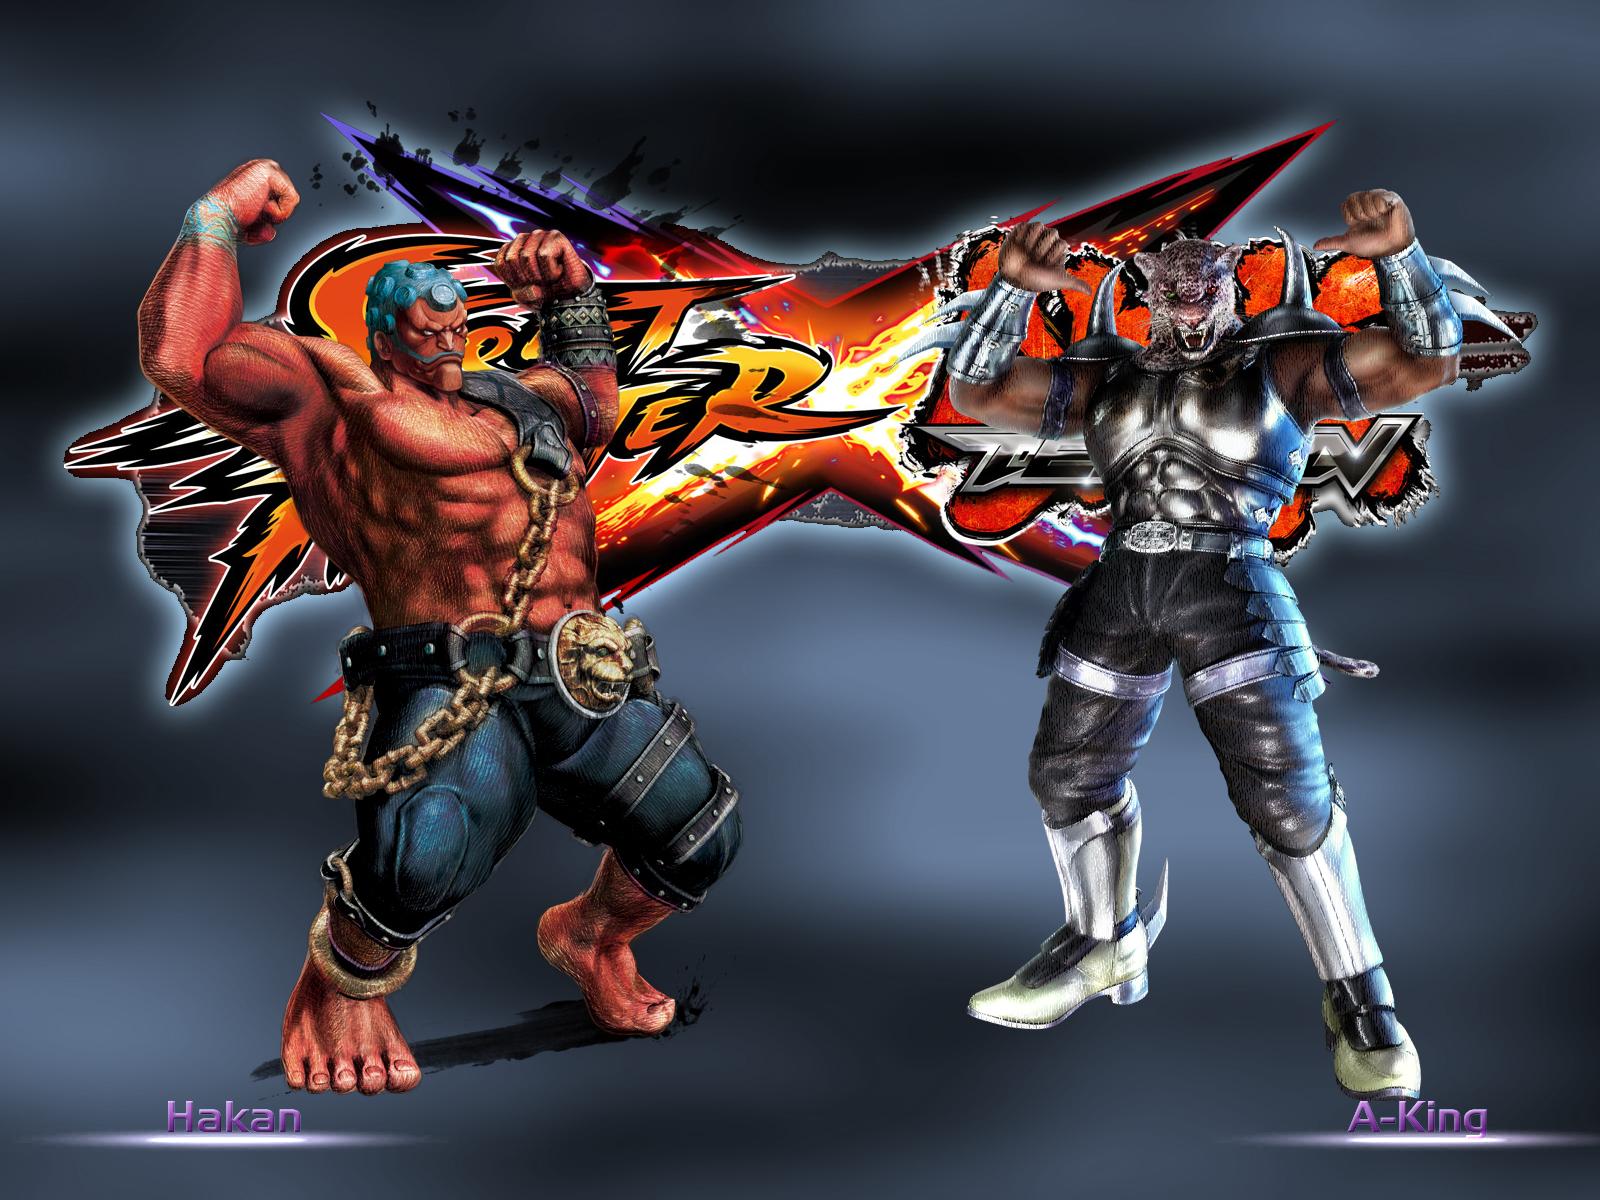 Hakan vs A-king - SFxTekken by khotebabu